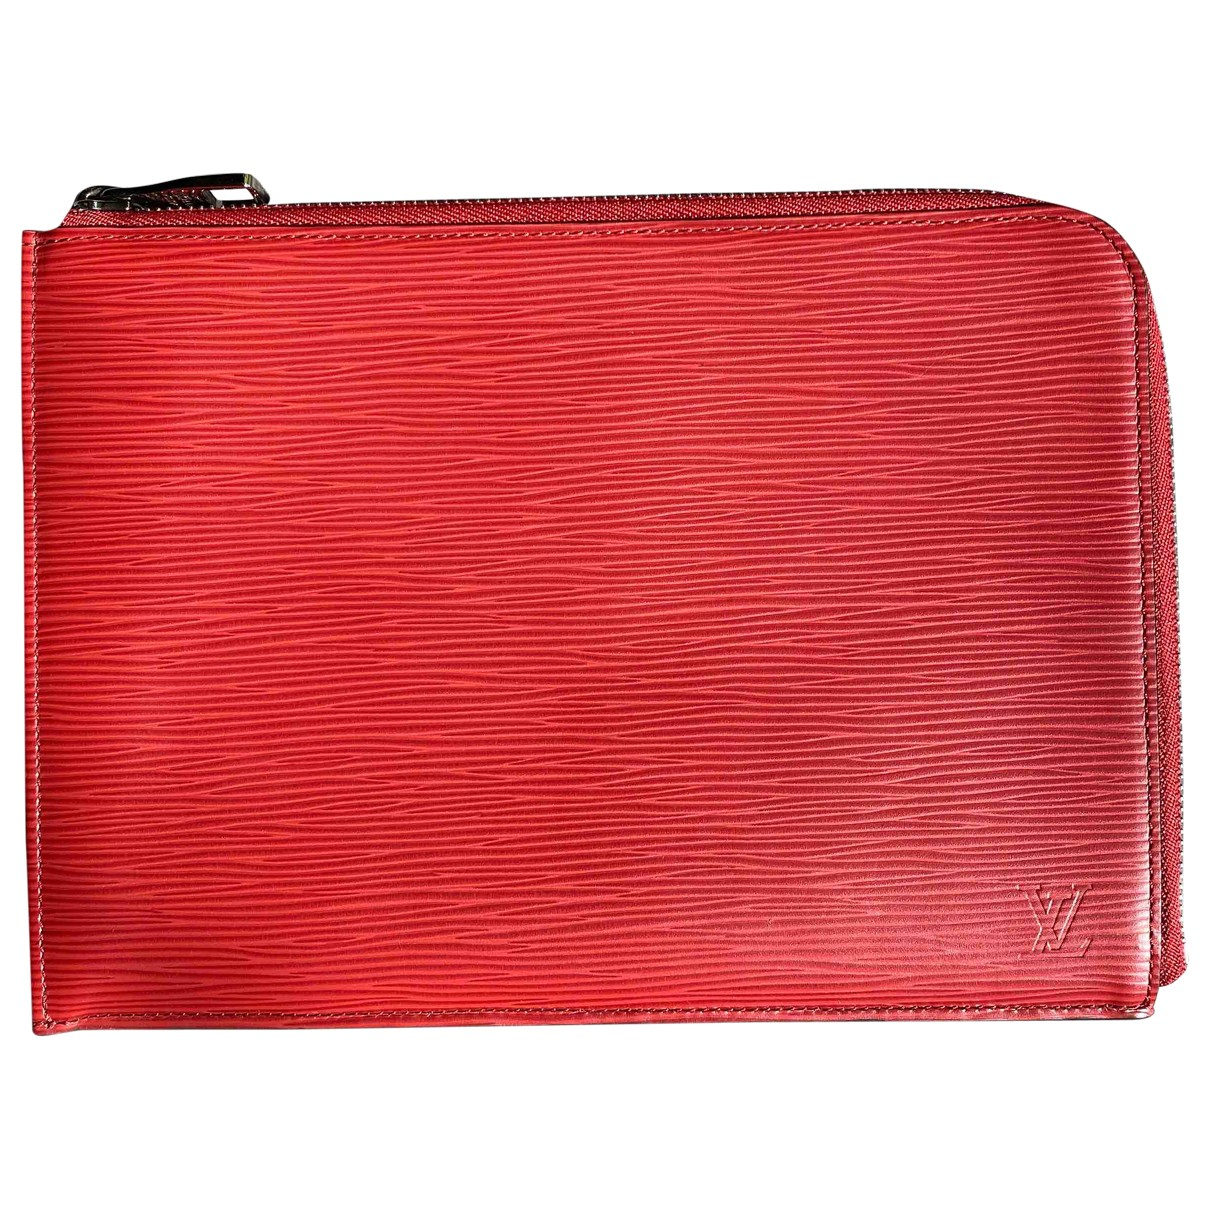 Louis Vuitton \N Orange Leather Small bag, wallet & cases for Men \N